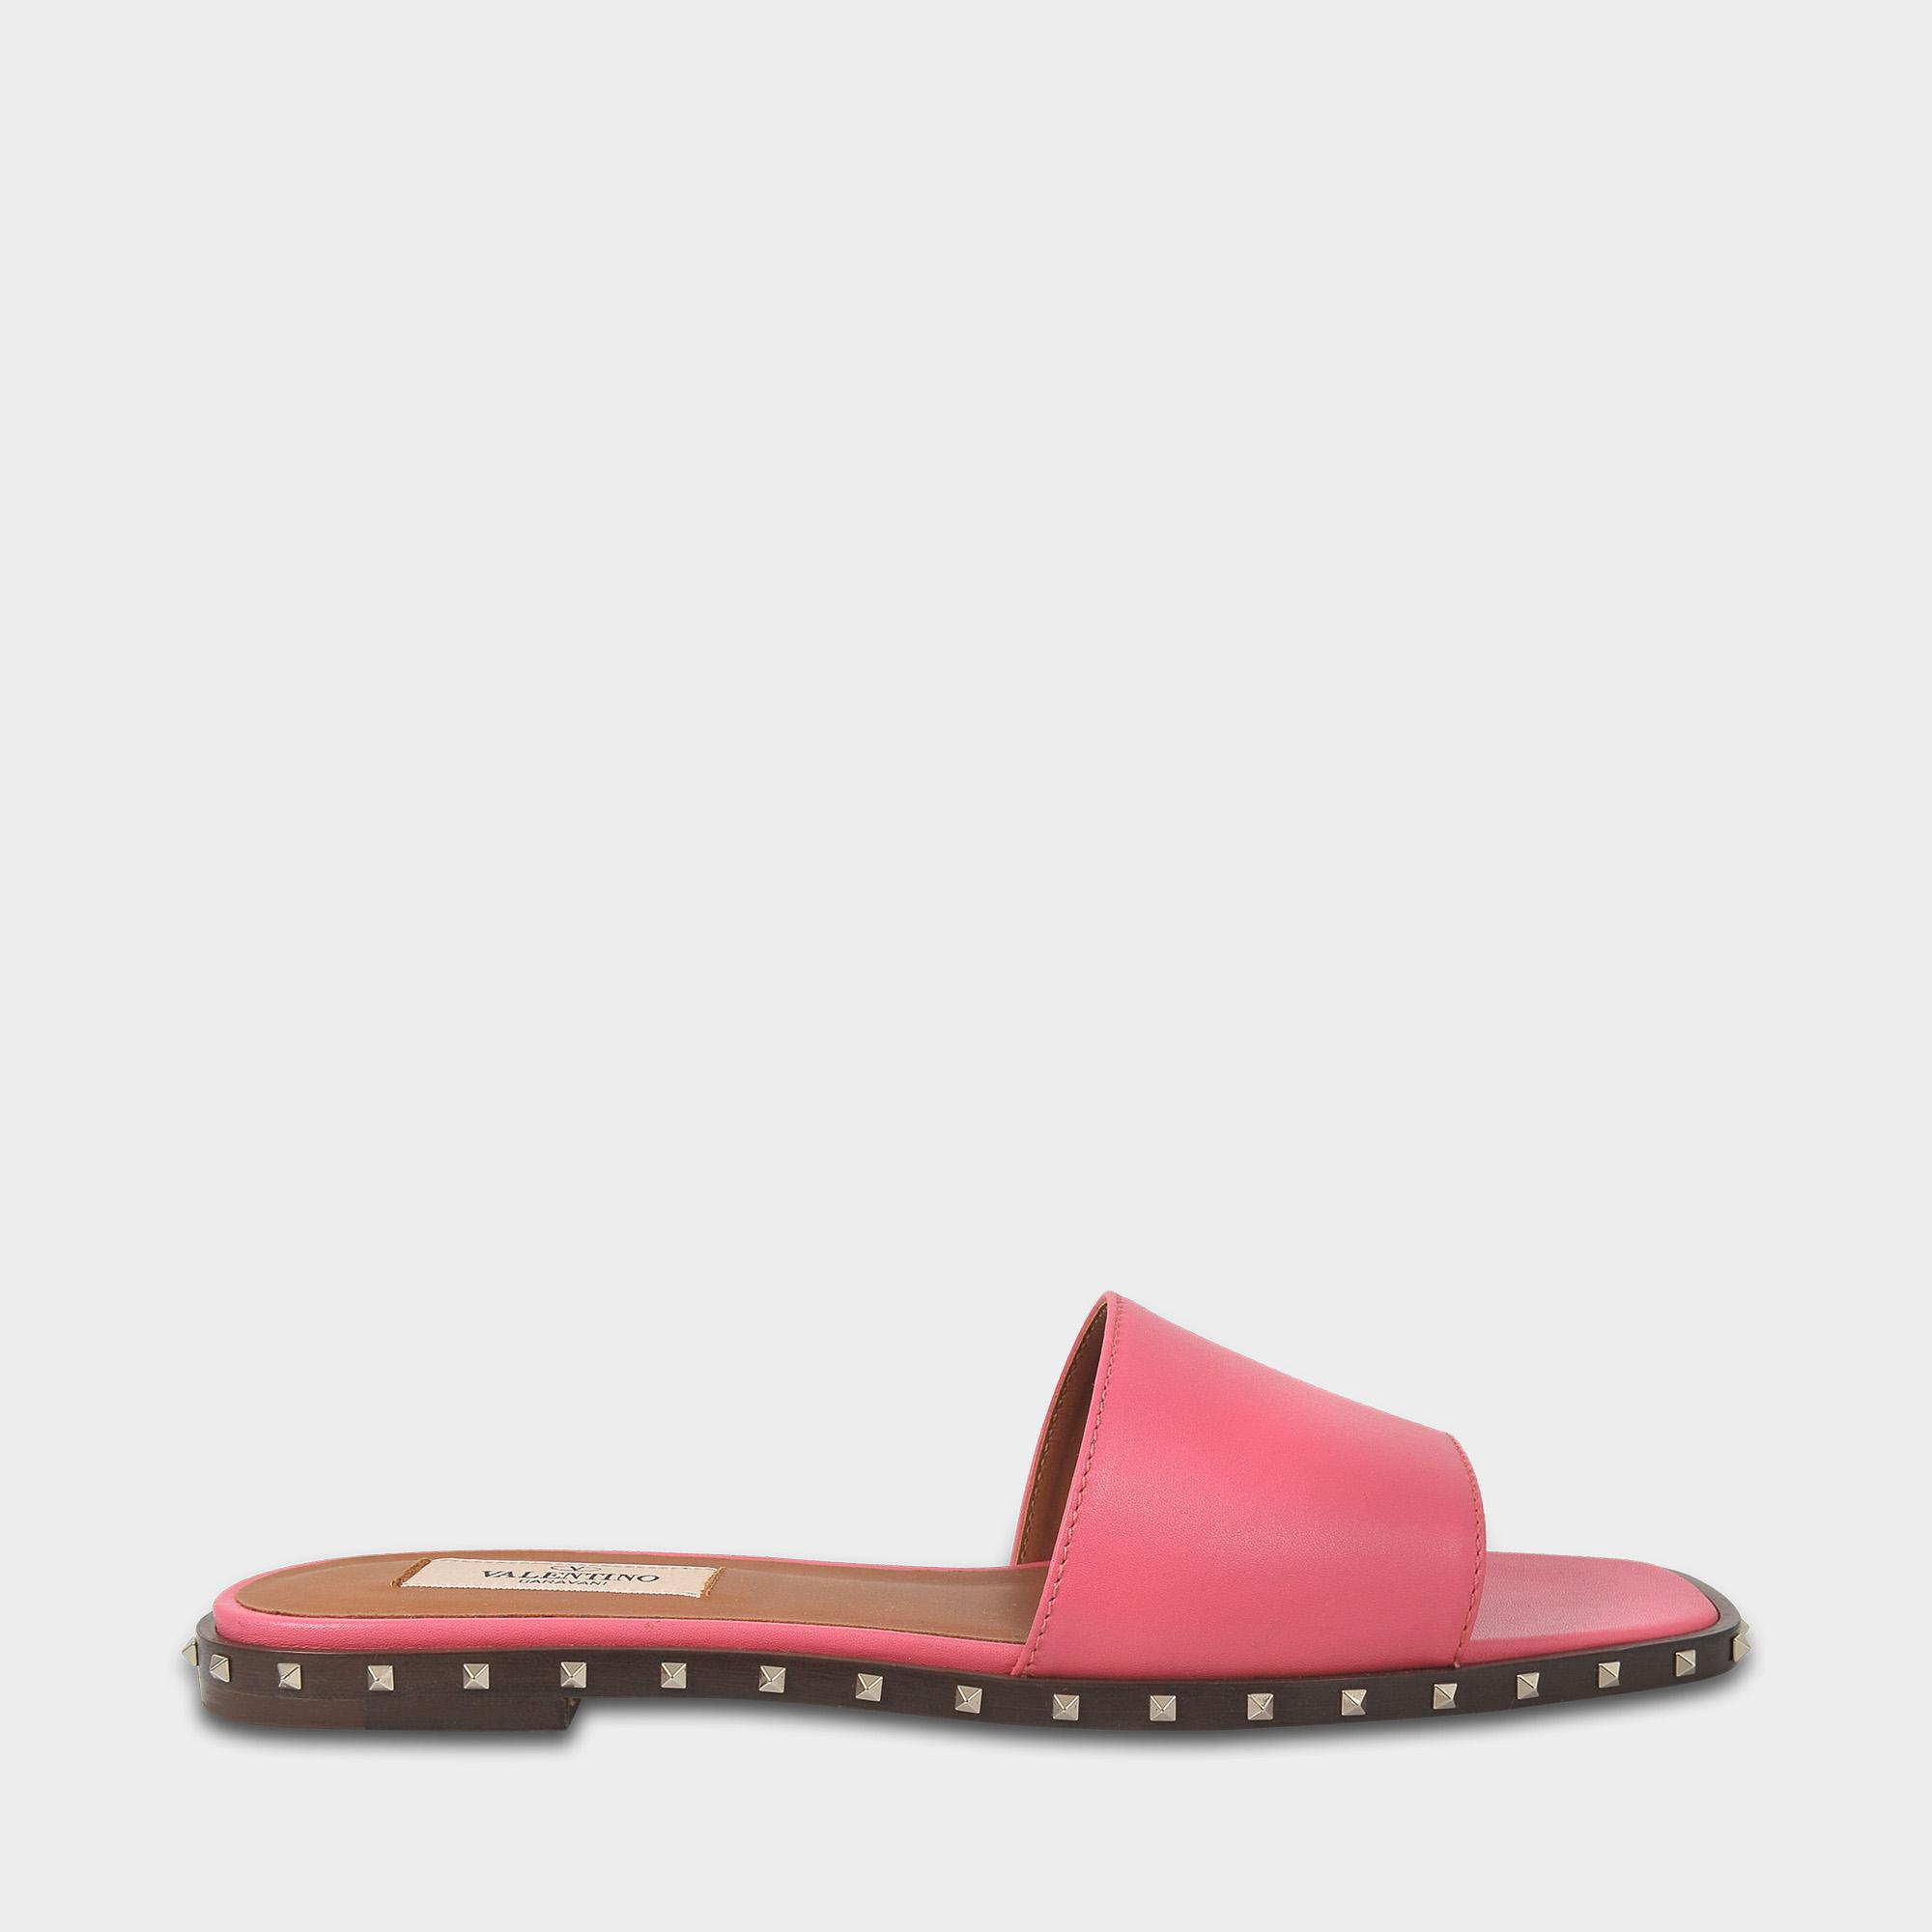 the latest 06b95 f9ae7 valentino--Soul-Rockstud-Slide-Shoes-In-Shadow-Pink-Calfskin.jpeg